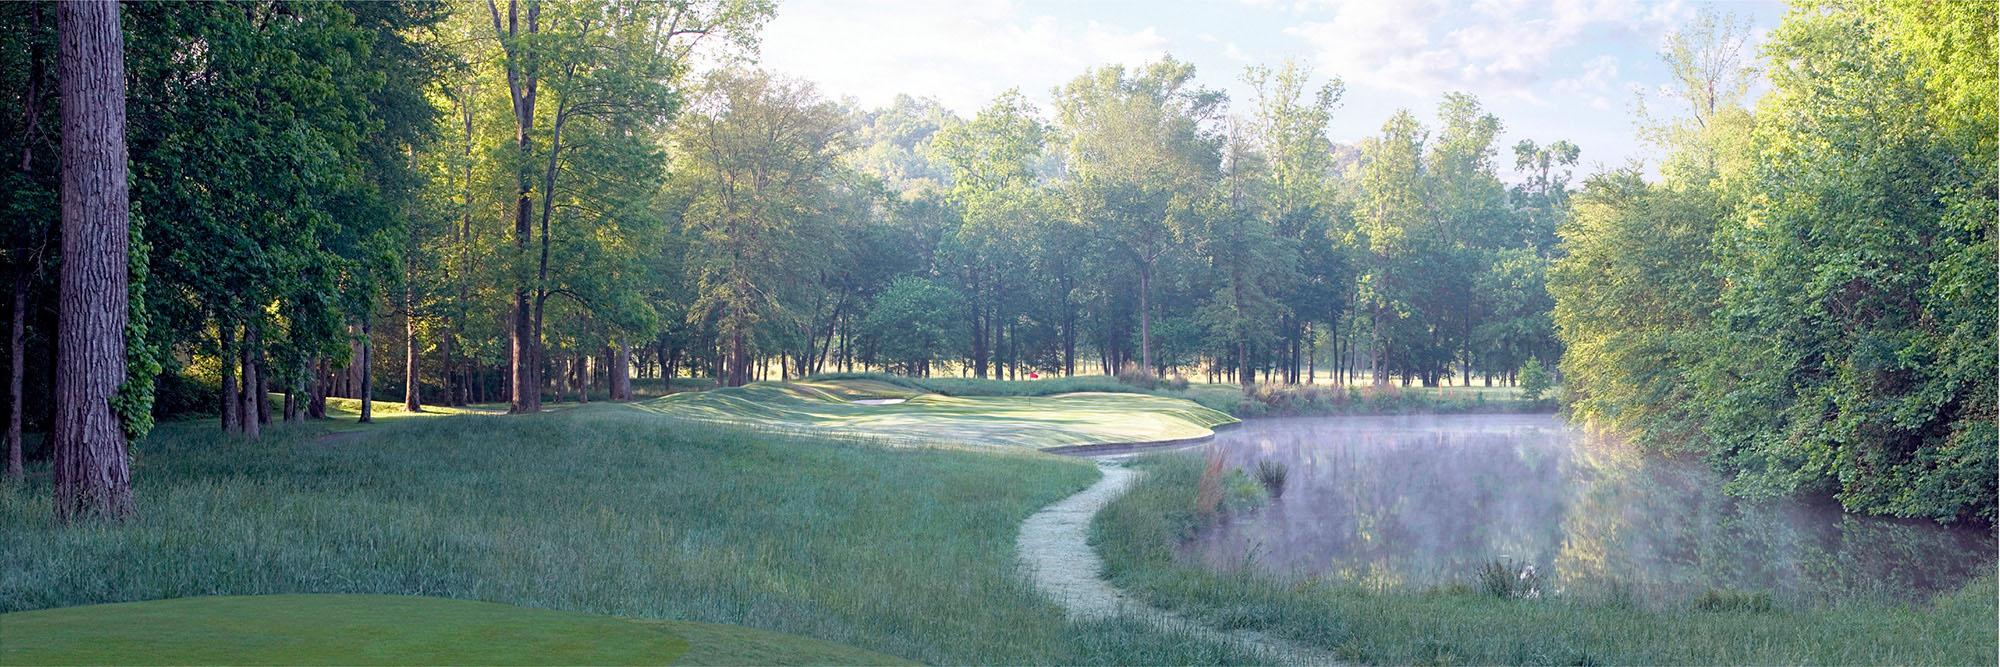 Golf Course Image - Settindown Creek No. 5